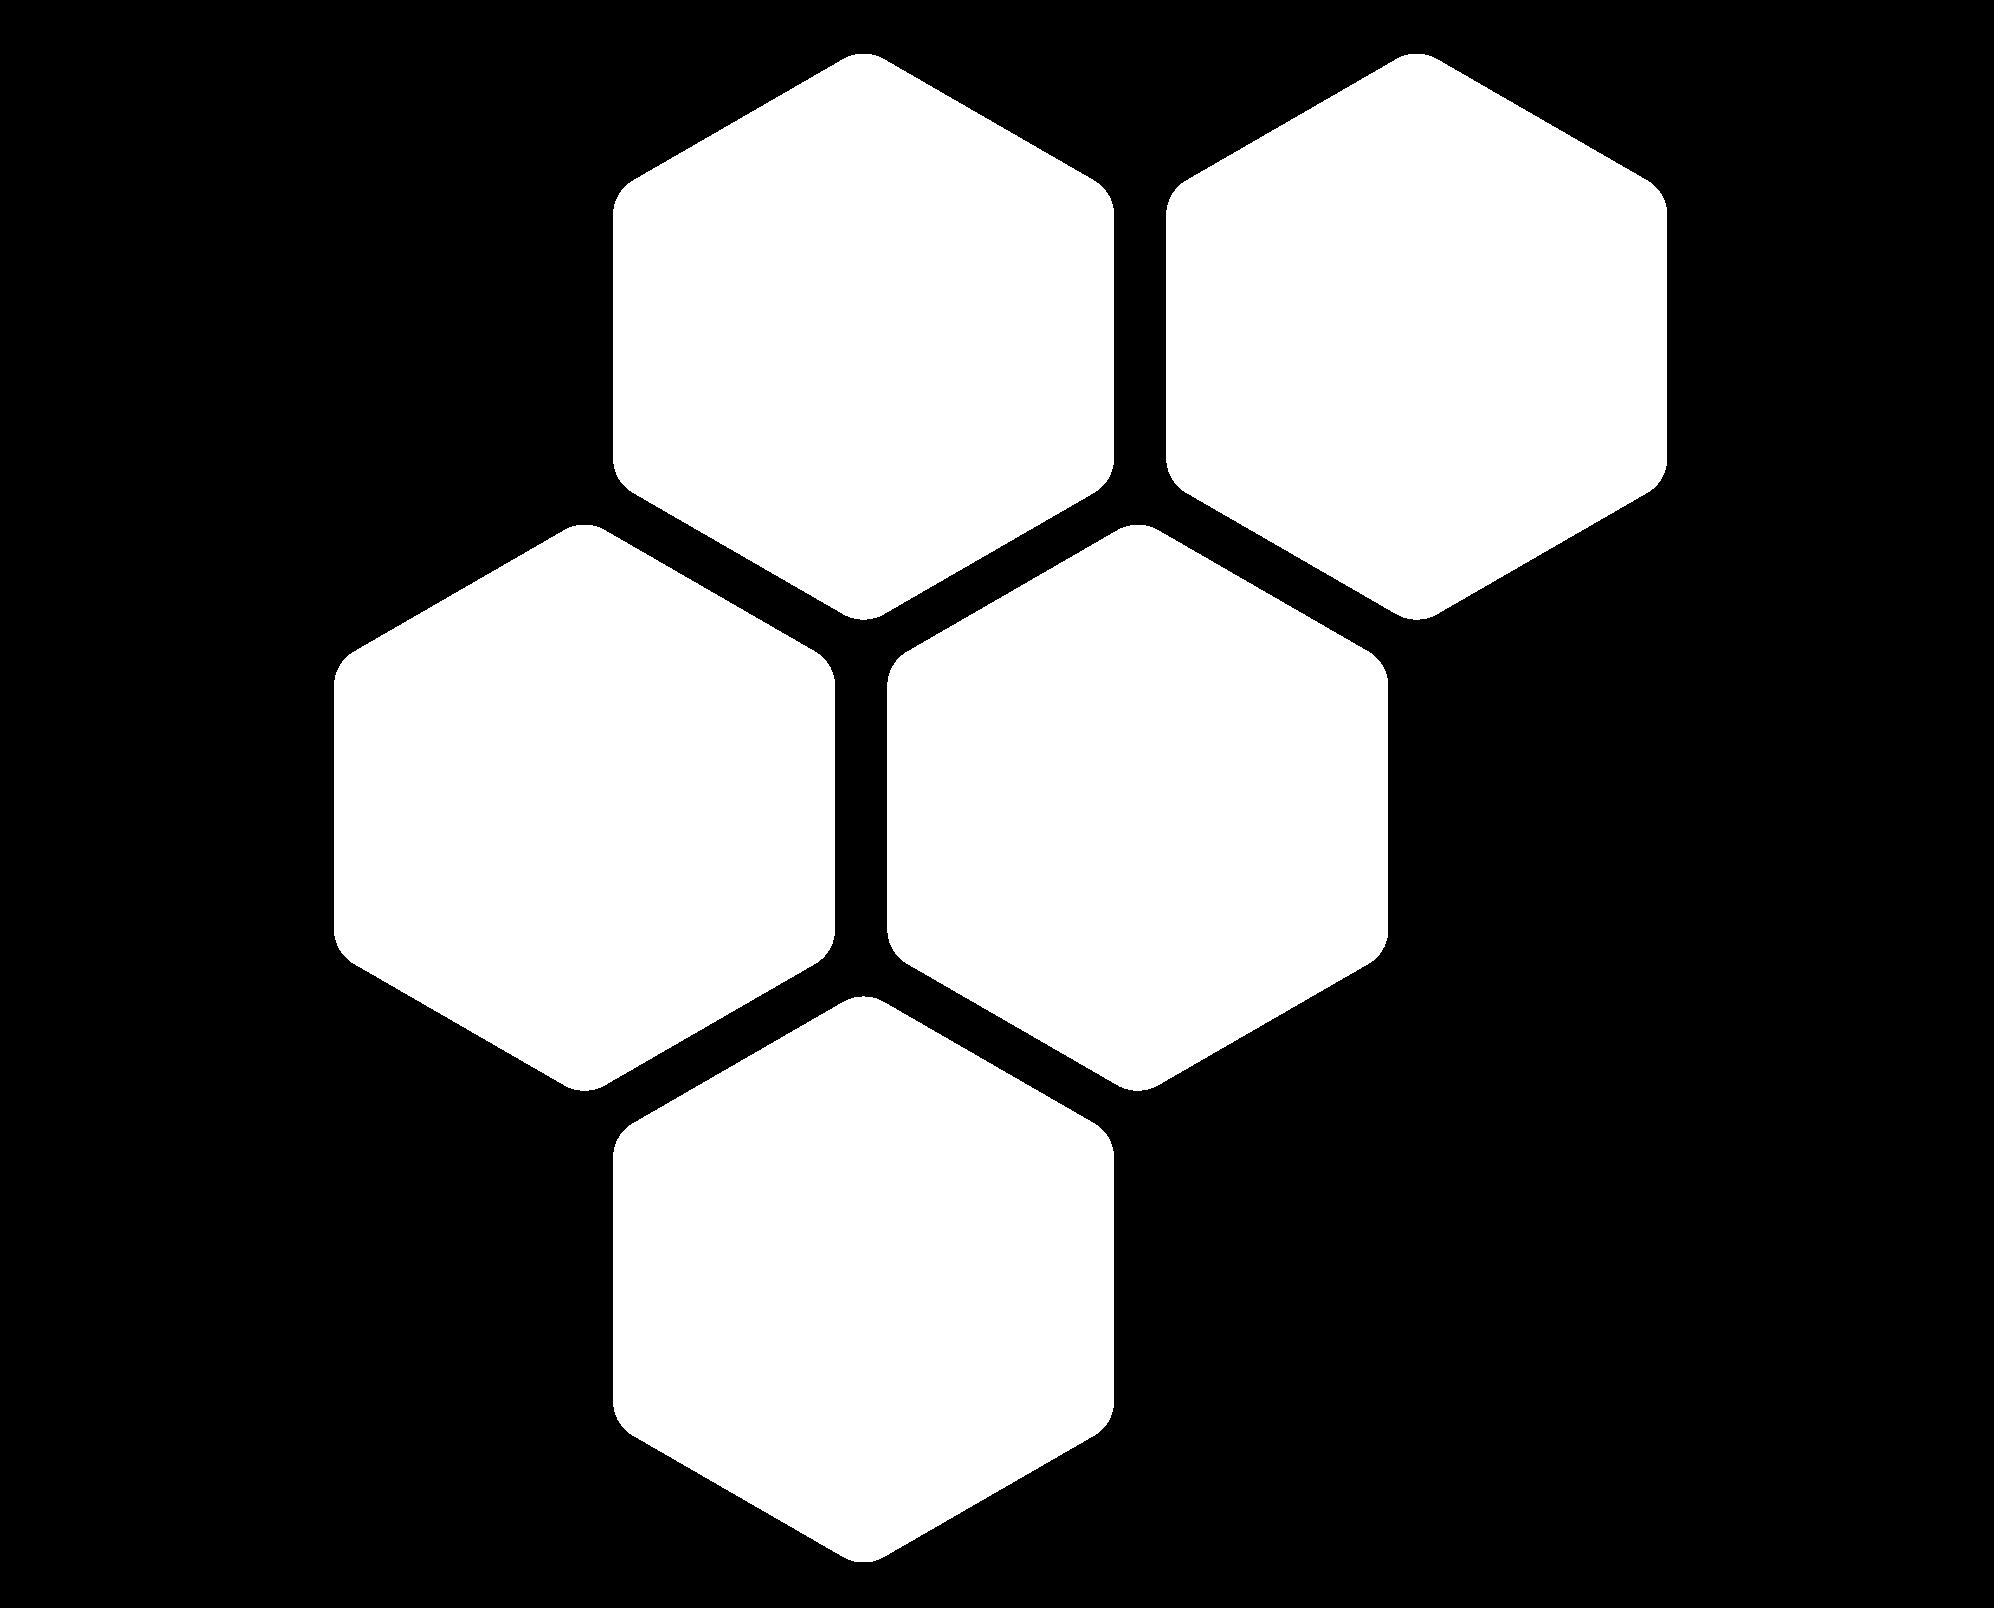 v3 0 0 | ZomboDB